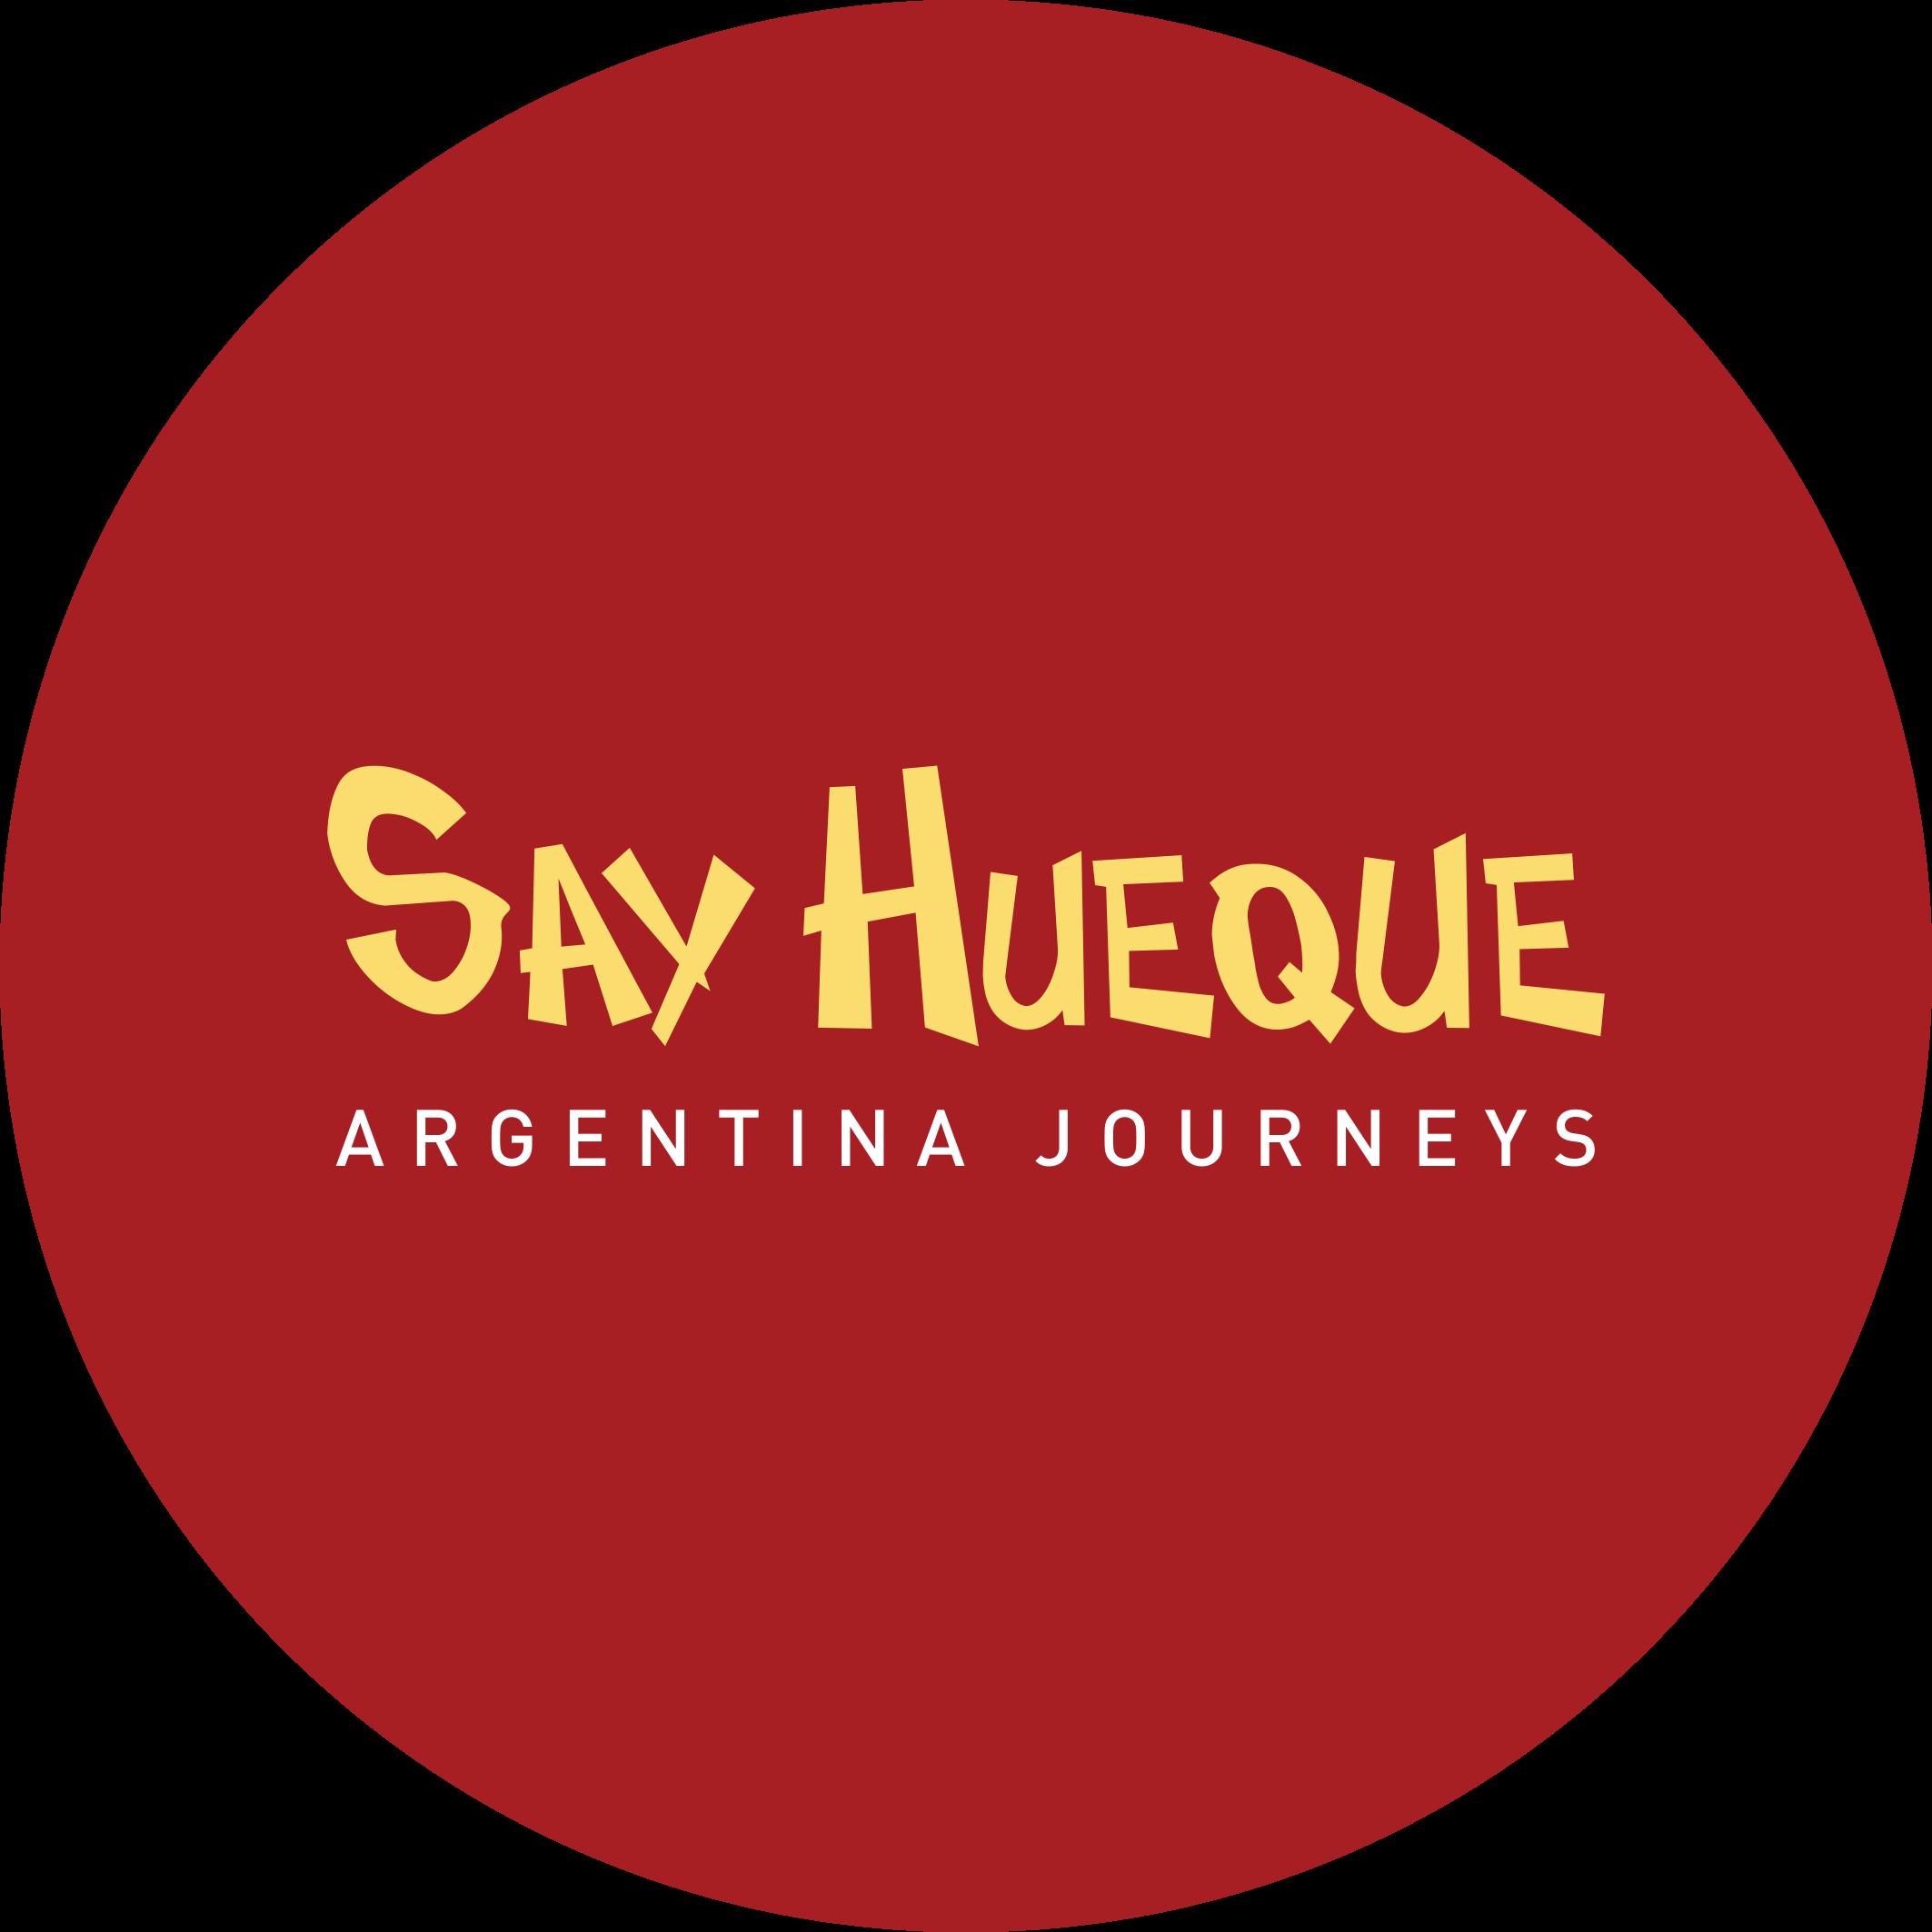 ARGENTINA-02-ALTA-circular.png